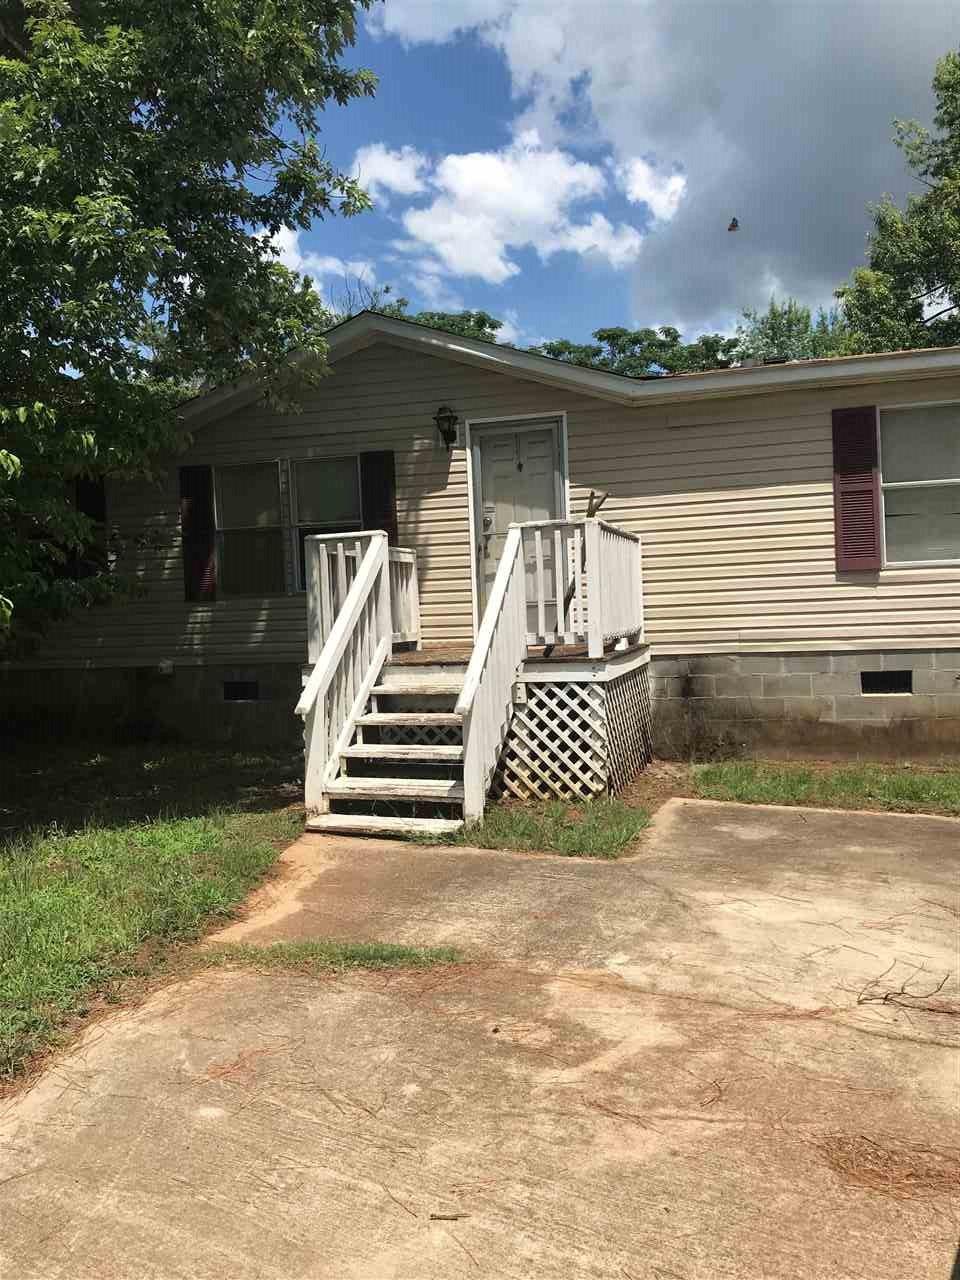 Homes for Sale in Byron GA Under 100K